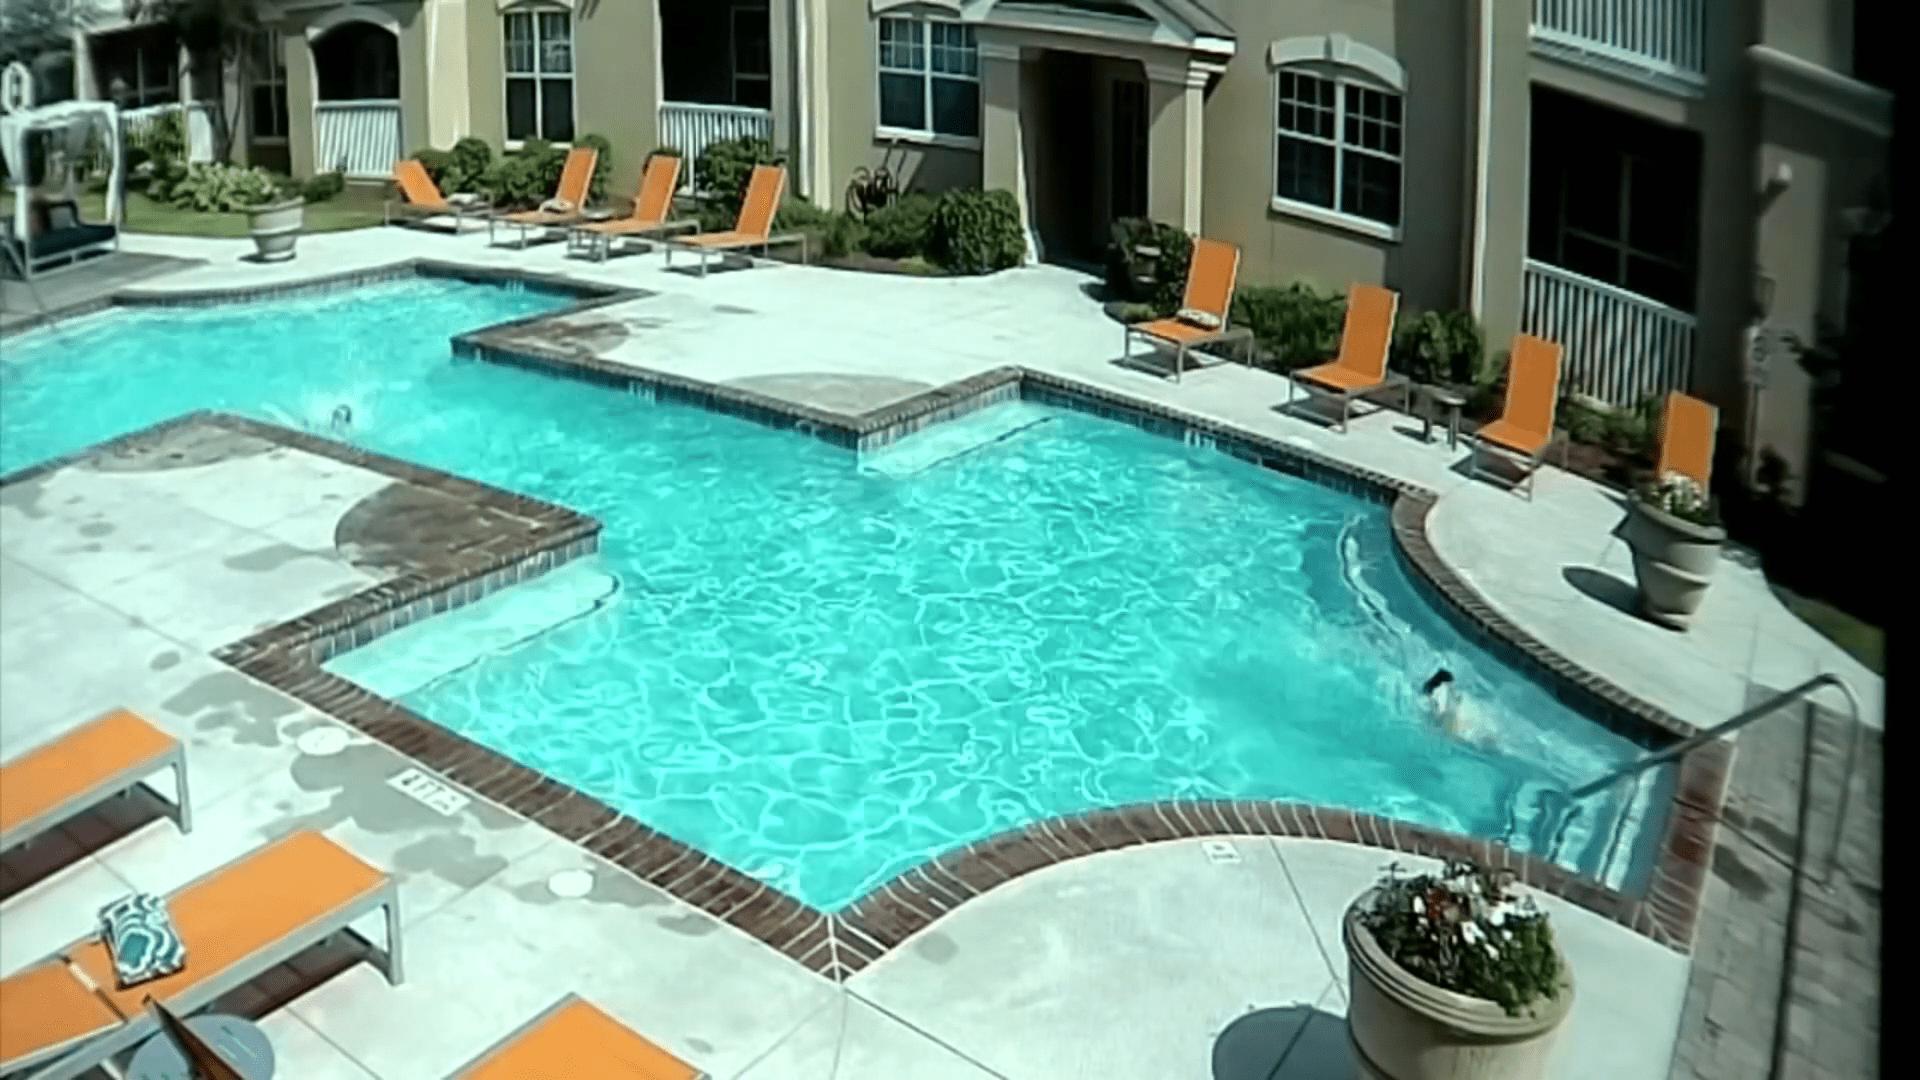 Kali entrando en la piscina │Imagen tomada de: YouTube /  WSAV3